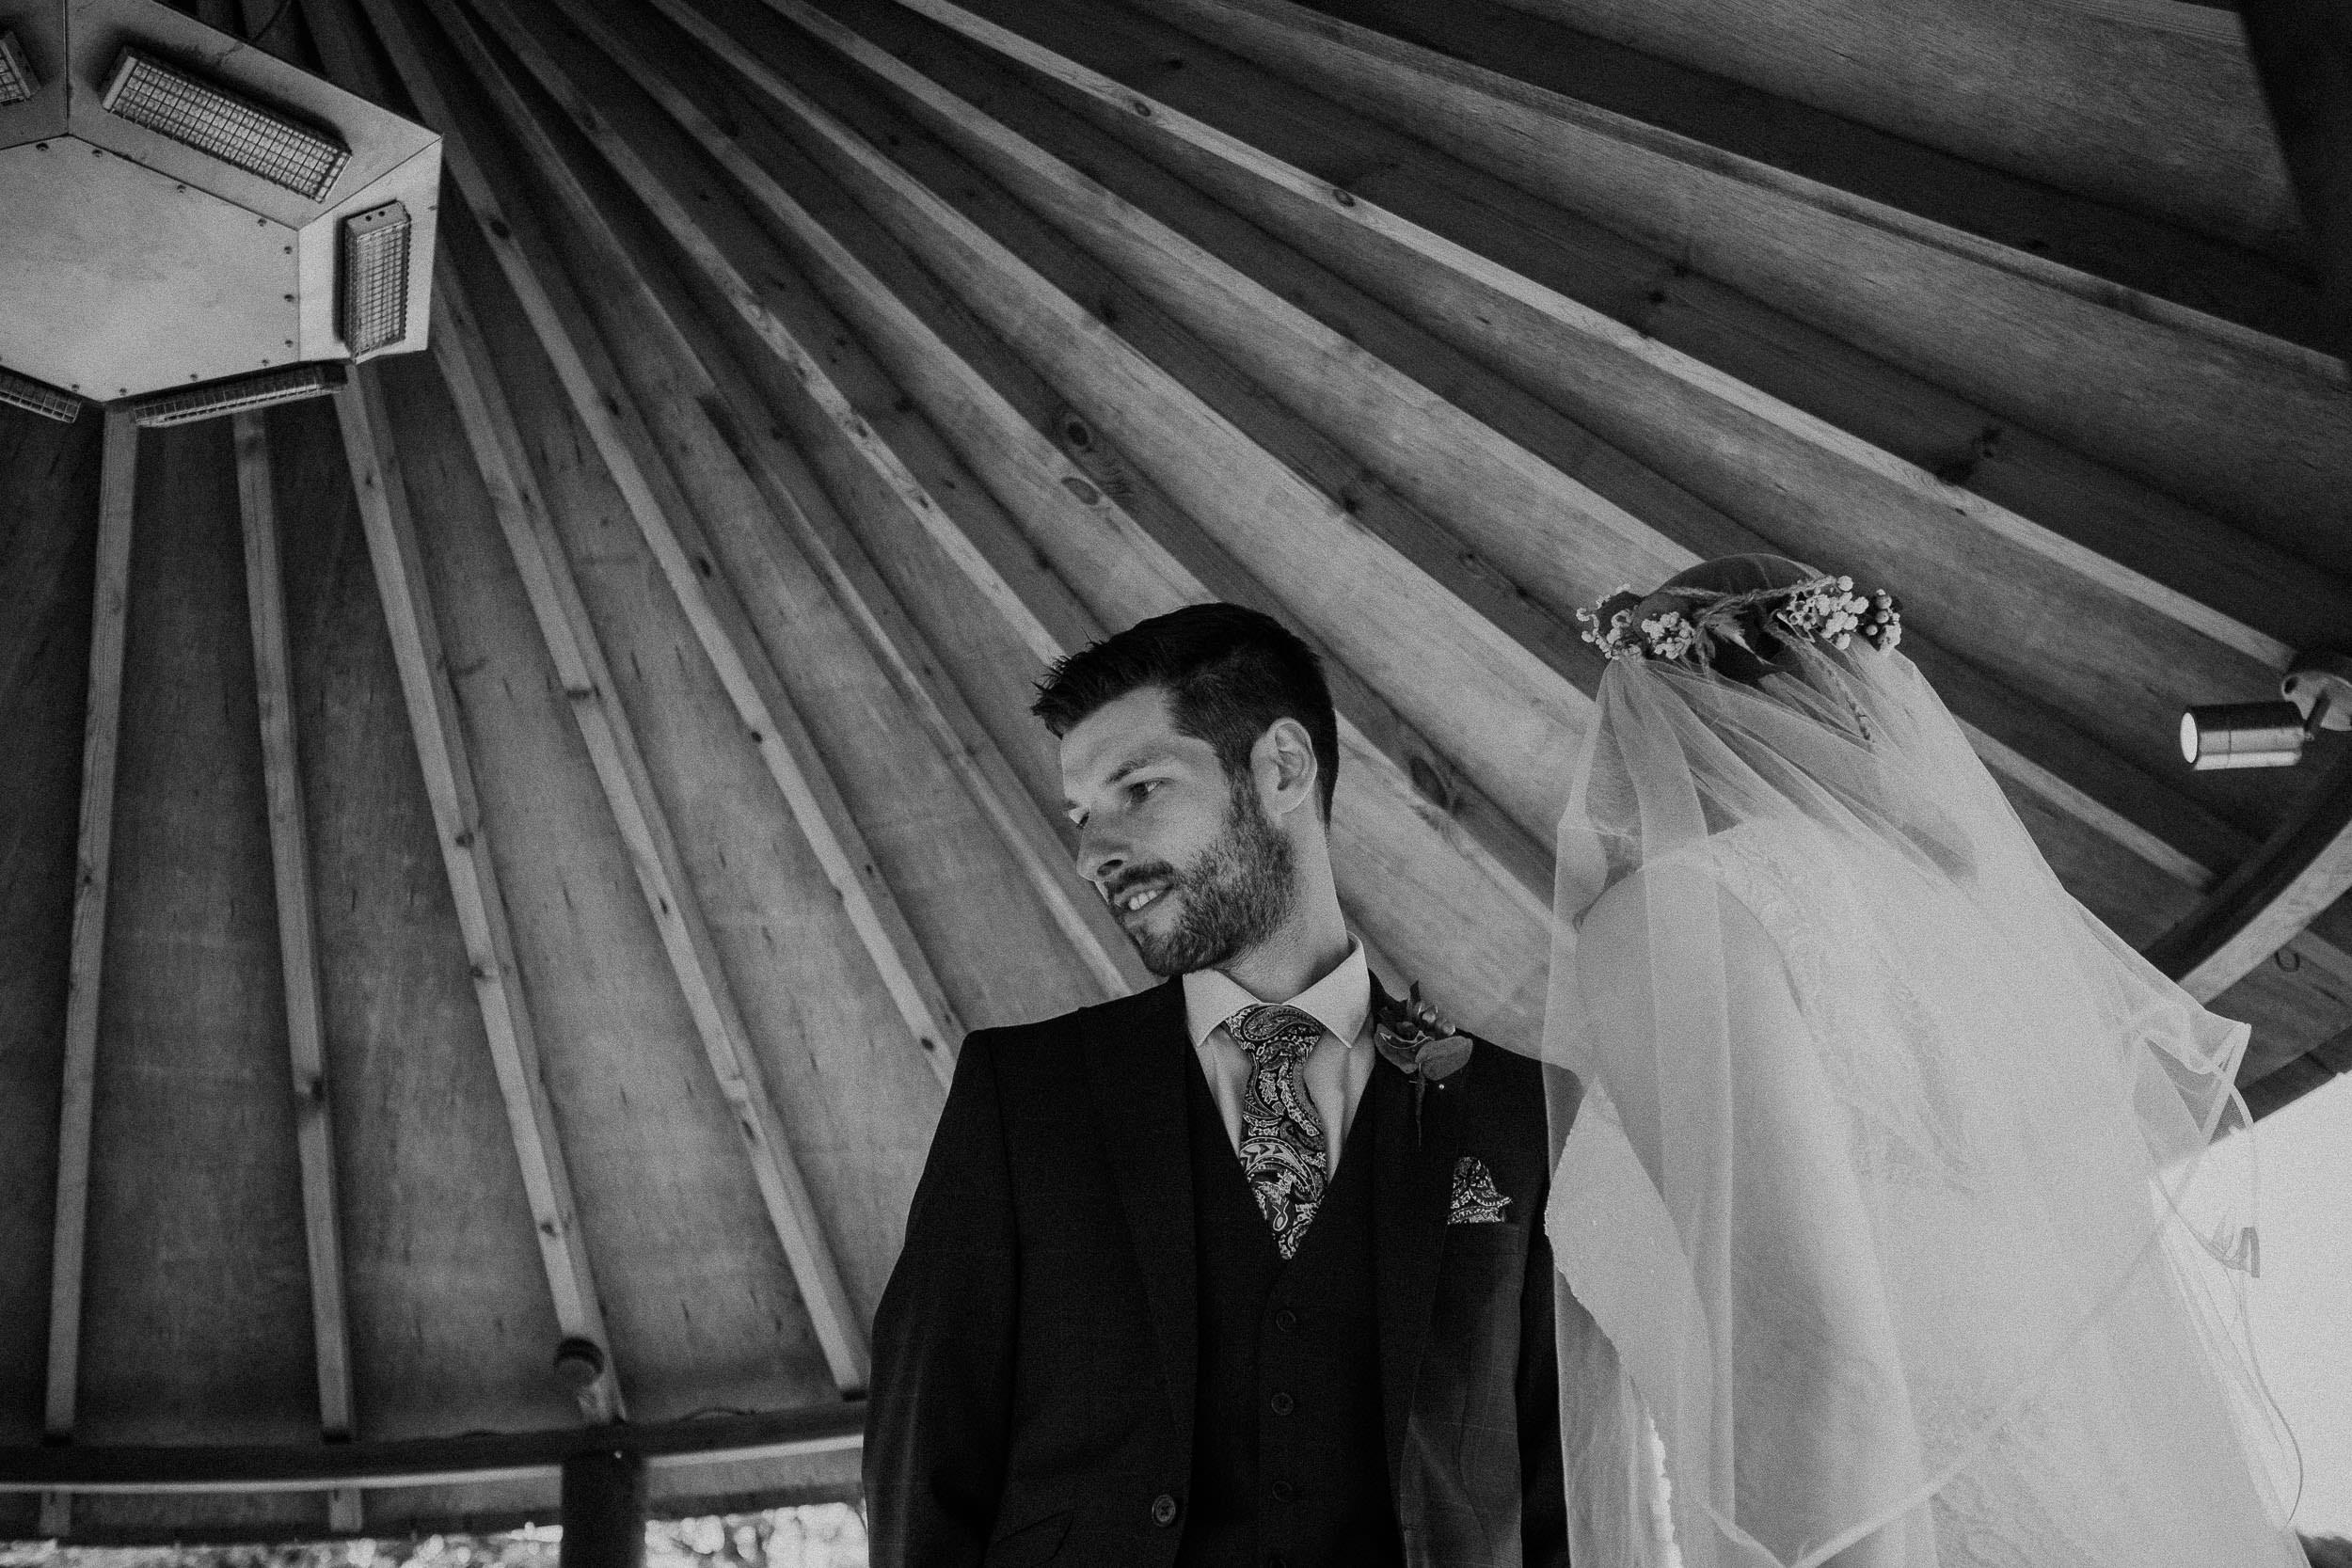 Black and white photo of groom under gazebo roof